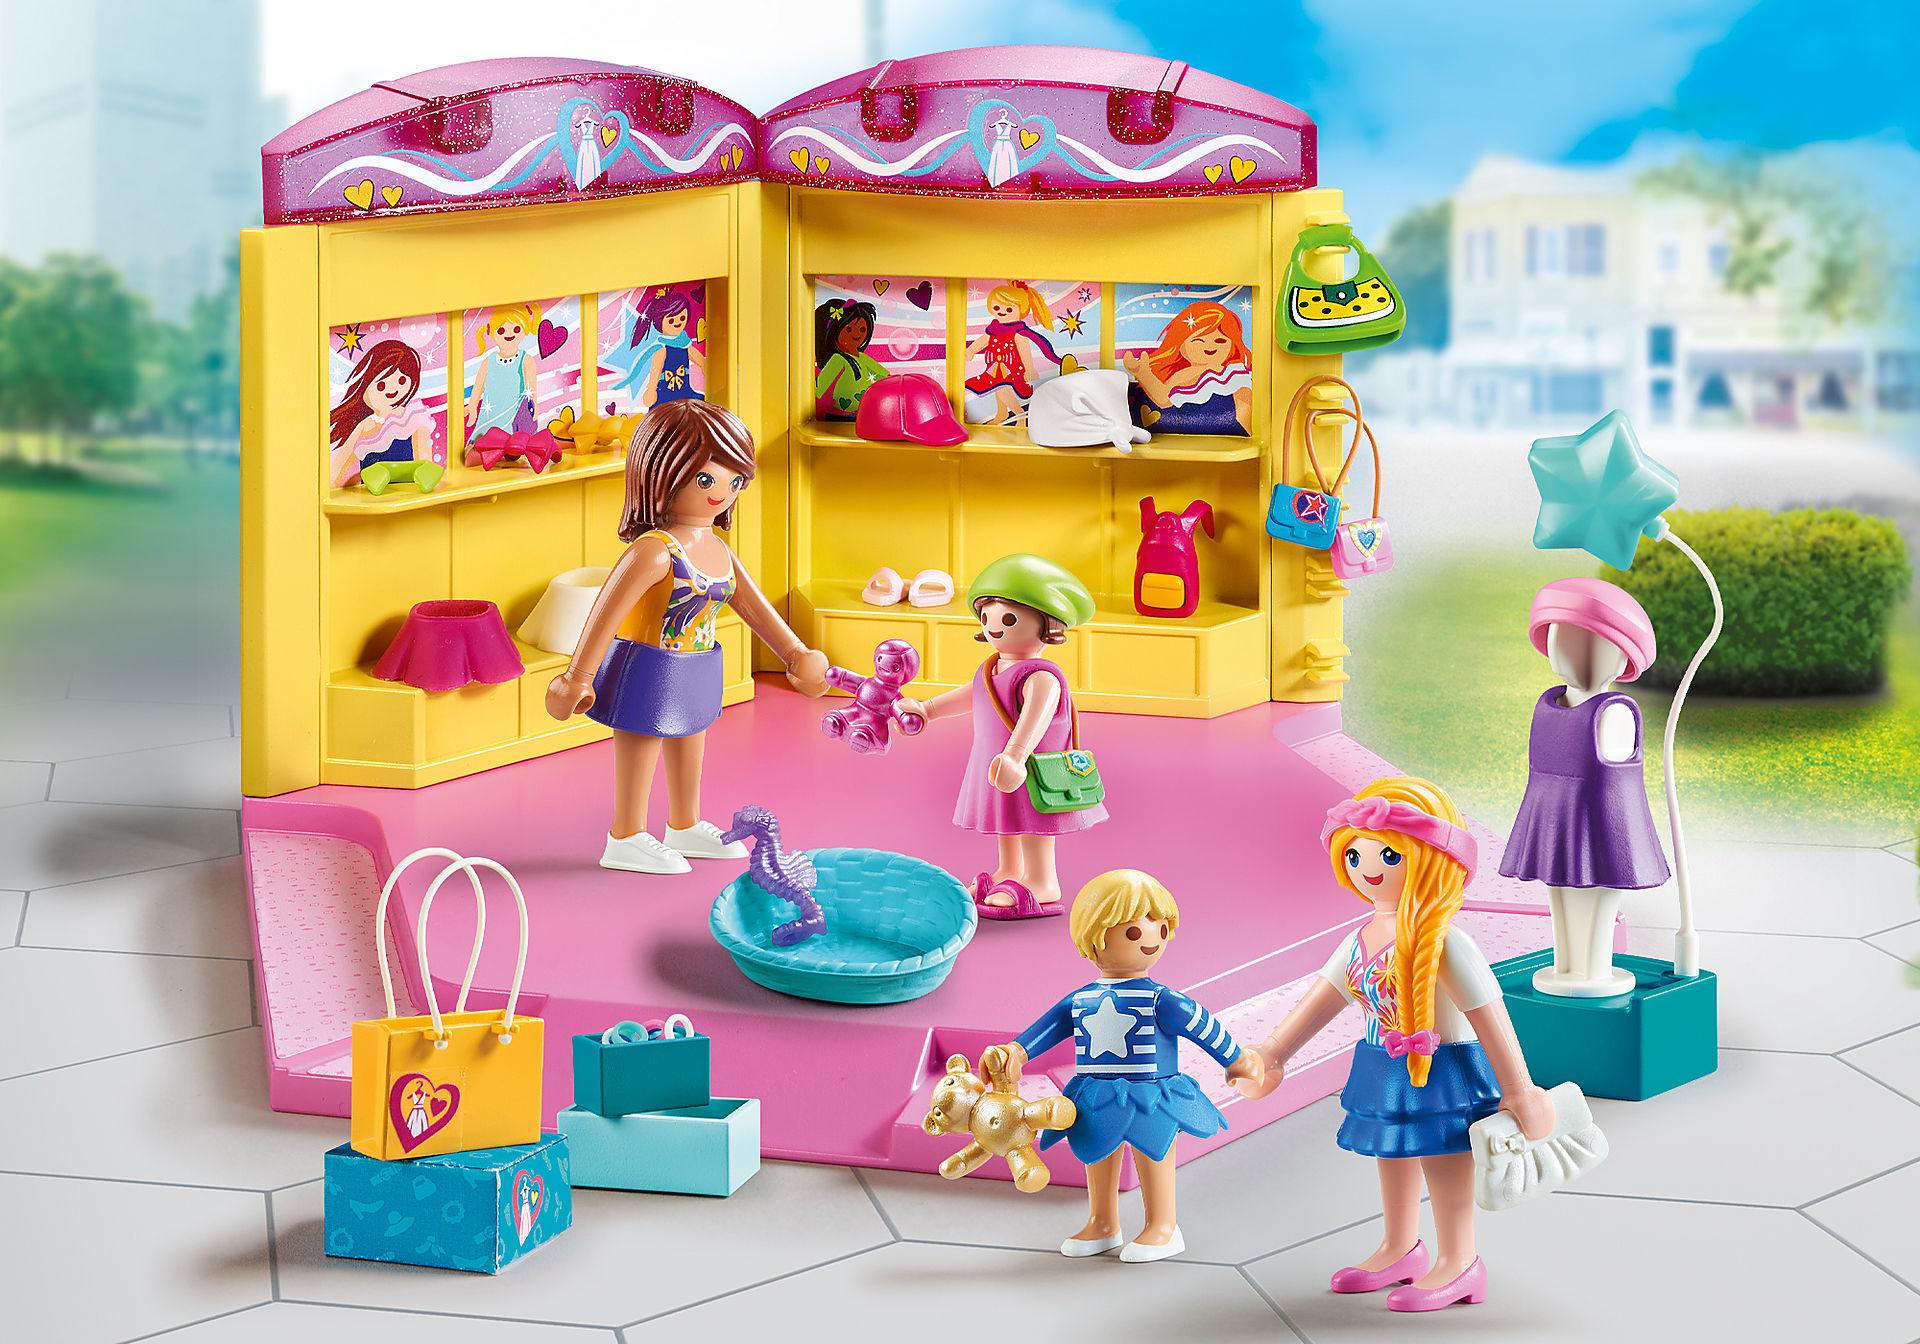 70592 Tienda de Moda Infantil zoom image1